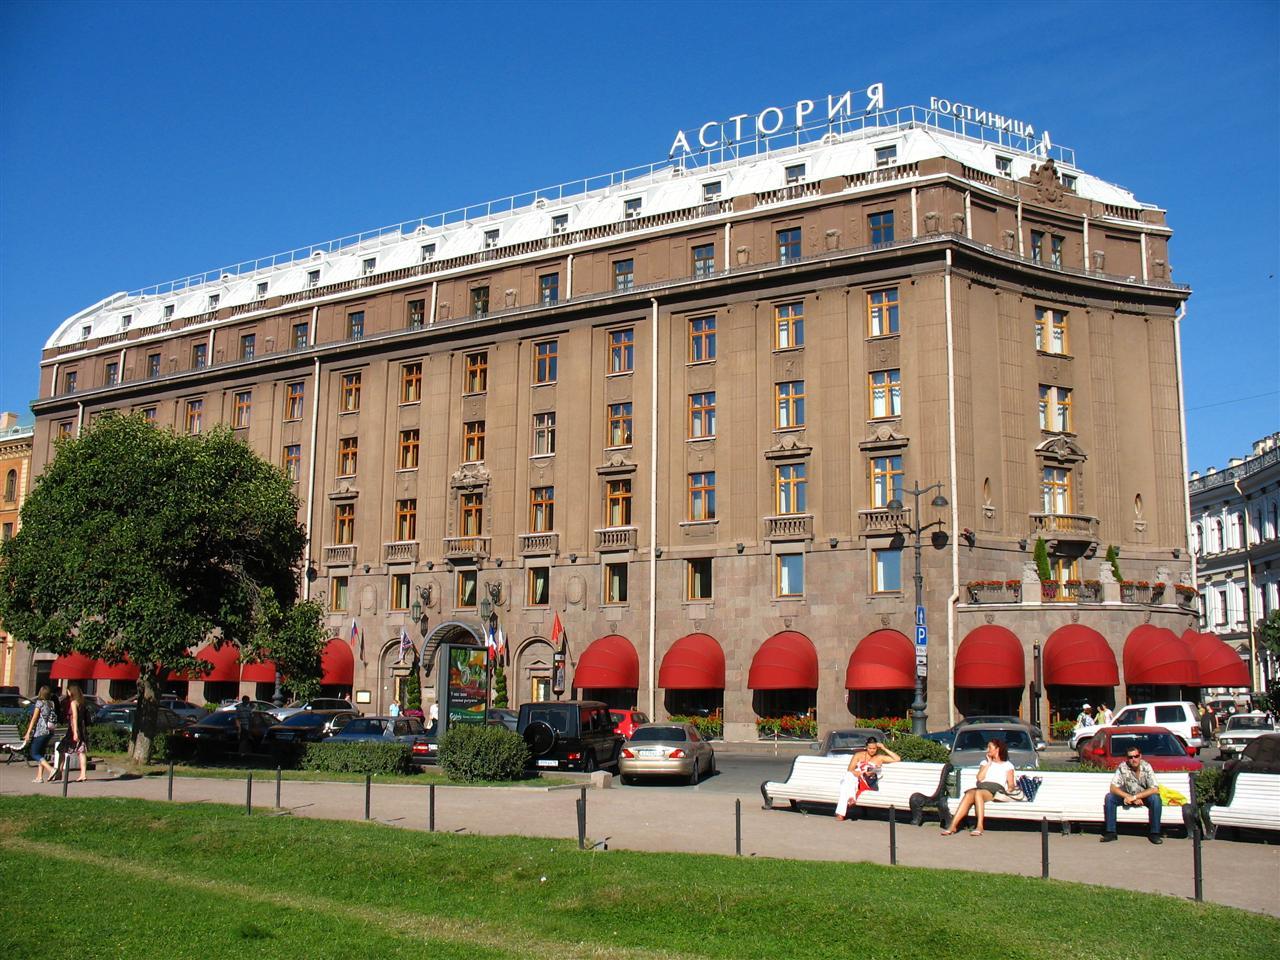 Hotel Astoria, St Petersburg